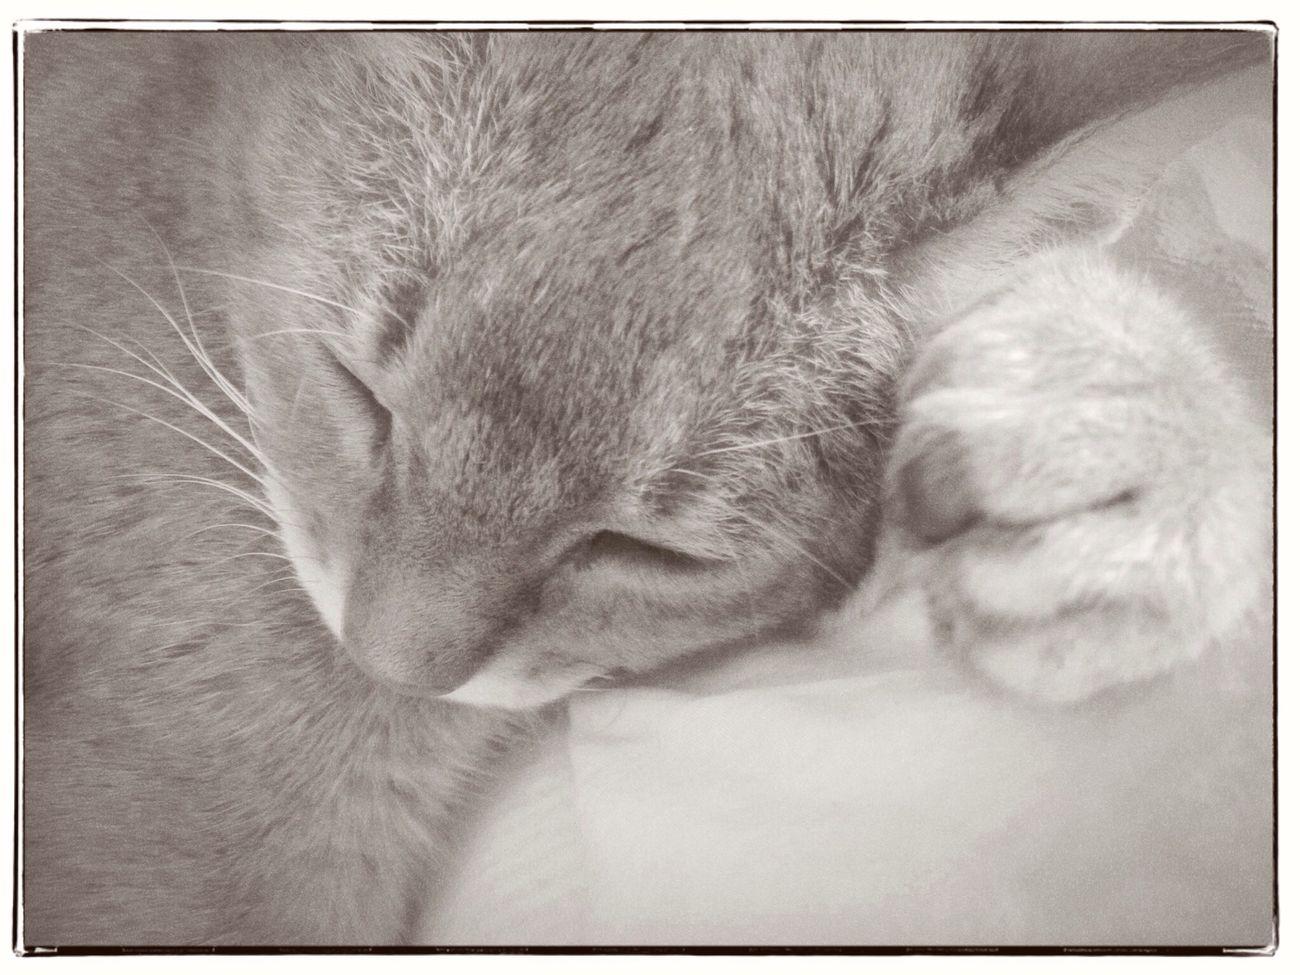 snooze on my paw Cats Of EyeEm Sleeping